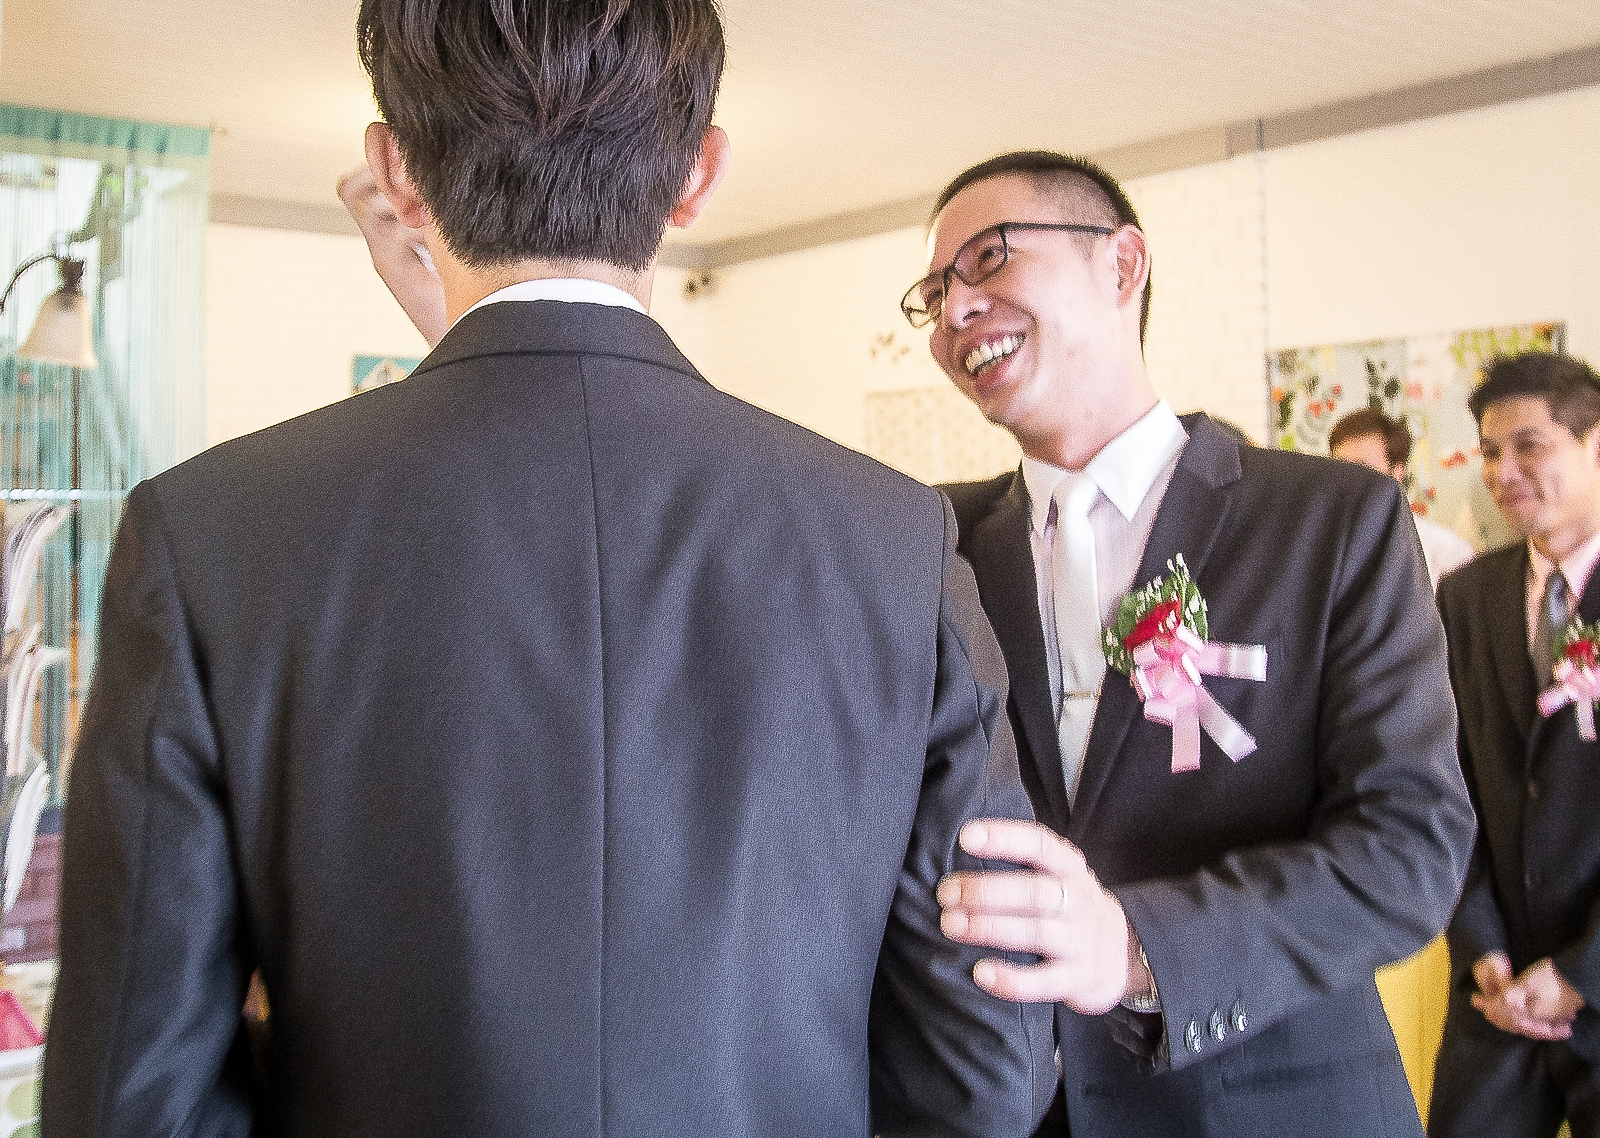 Wedding-婚攝Q比-酷比攝CUBY-PHOTOGRAPHY-宜蘭金樽喜慶宴會廣場-09